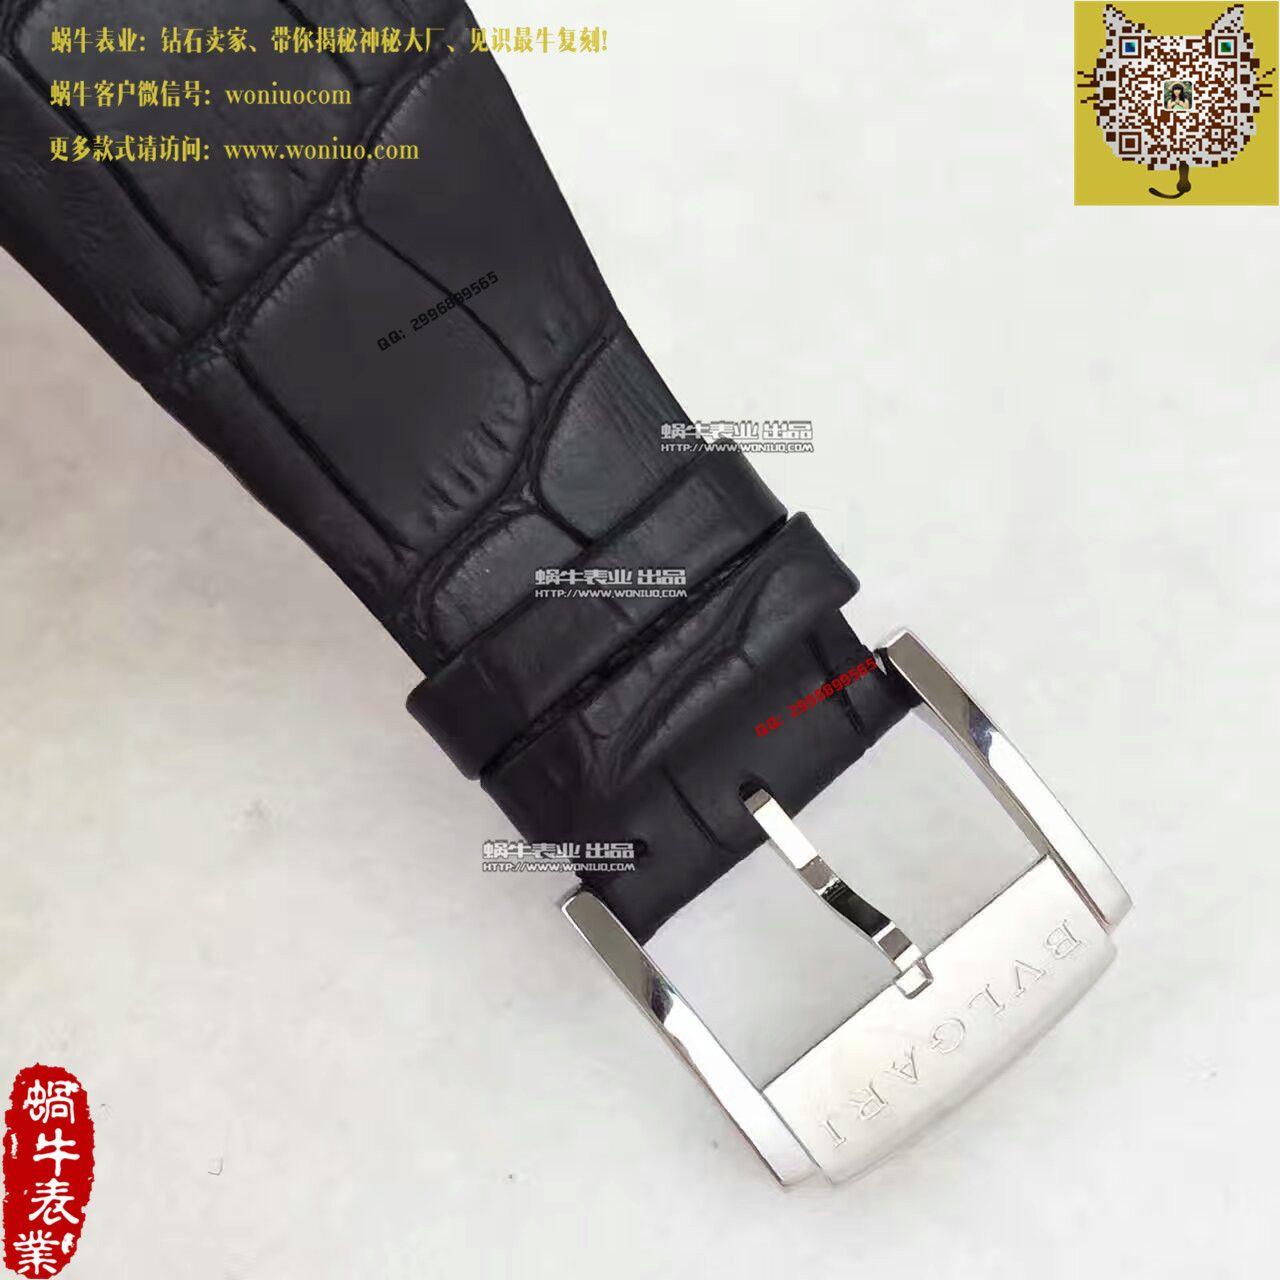 【TF厂1:1精仿手表】宝格丽OCTO系列102138 BGO40BPLTBXT腕表《手动陀飞轮》 / BG010